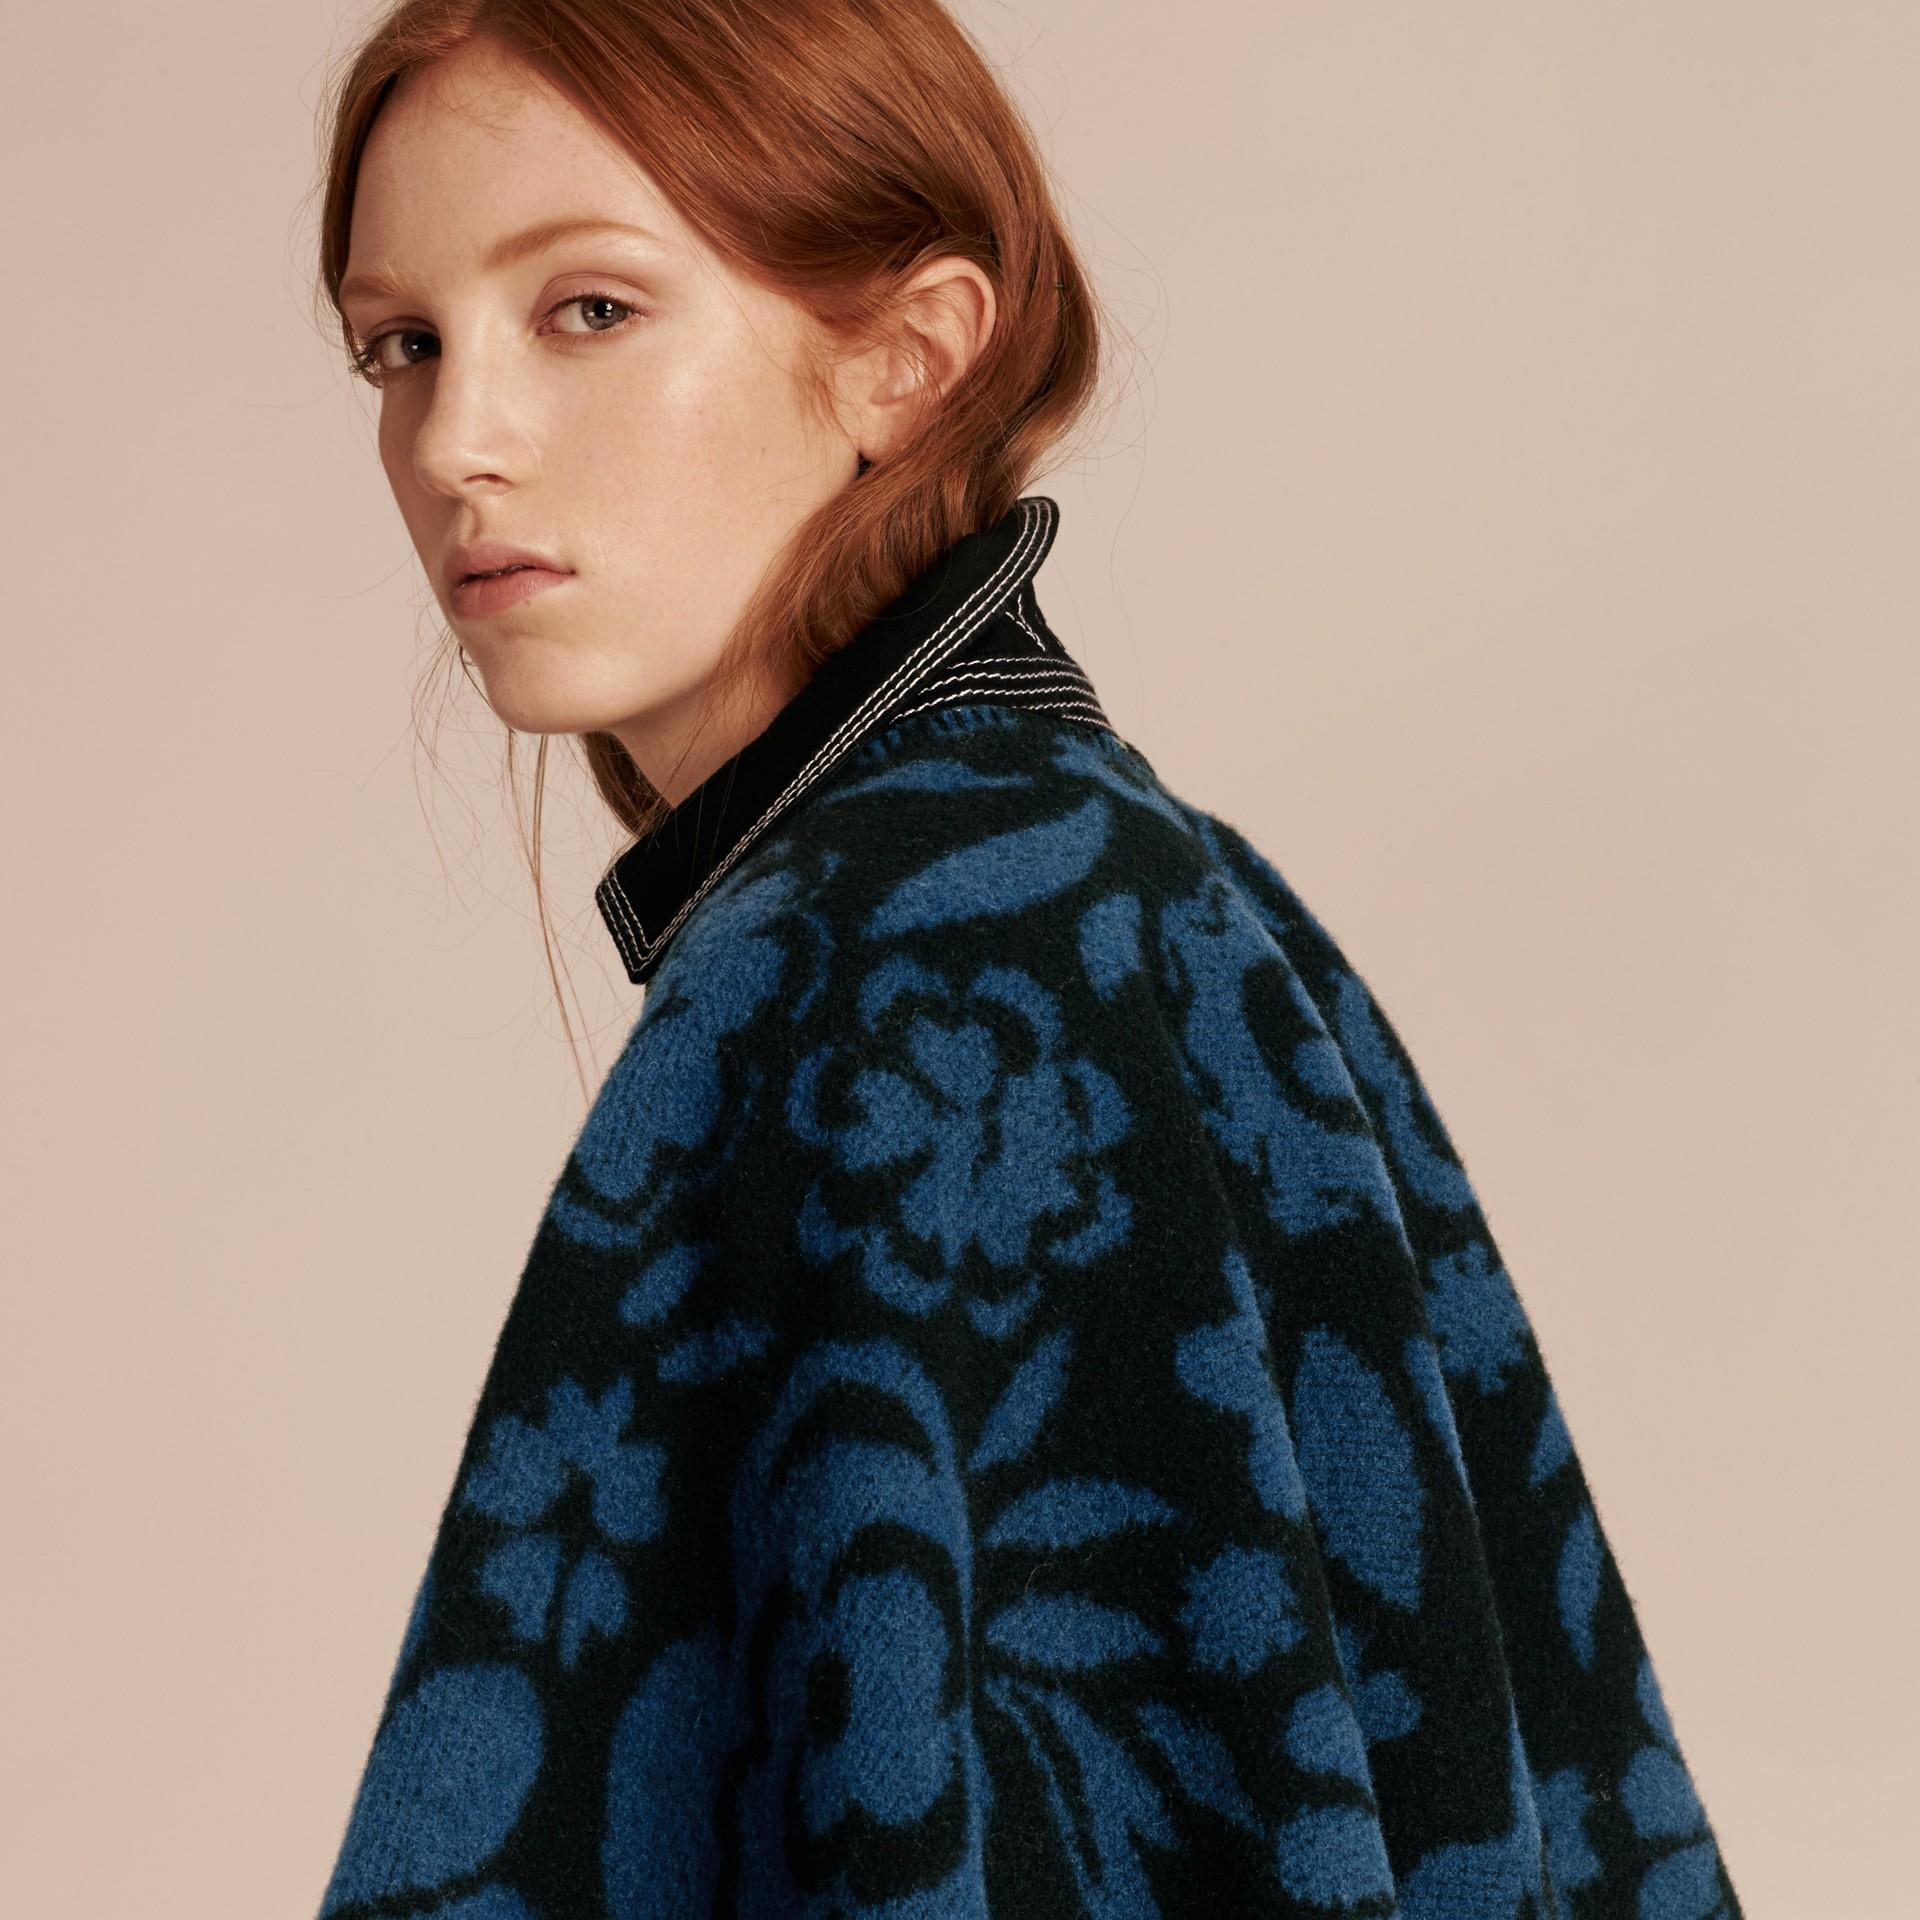 Ozeanblau Jacquard-Poncho aus Wolle und Kaschmir mit floralem Muster - Galerie-Bild 5